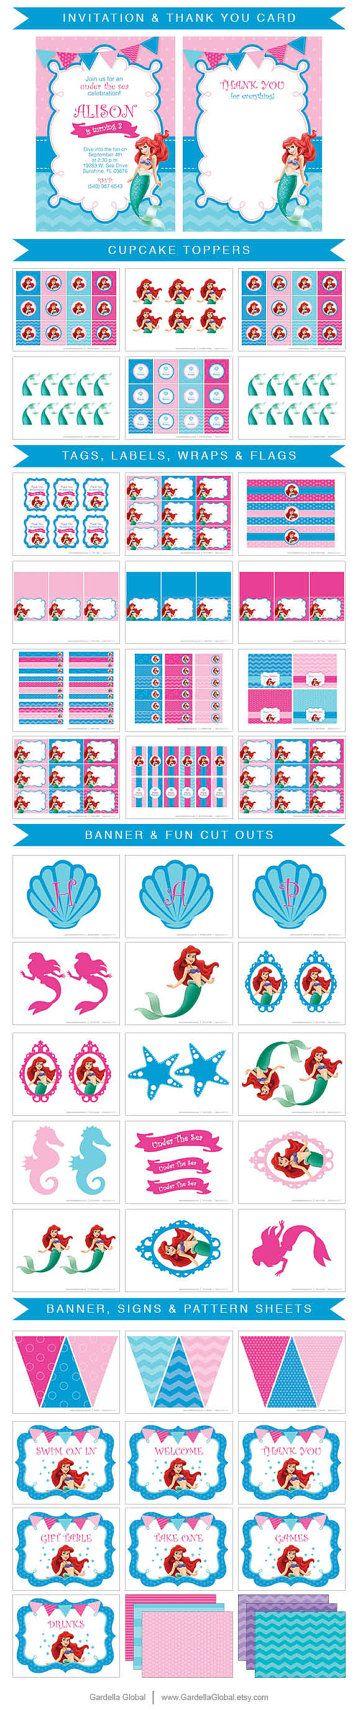 Little Mermaid Invitation Little Mermaid invite by GardellaGlobal